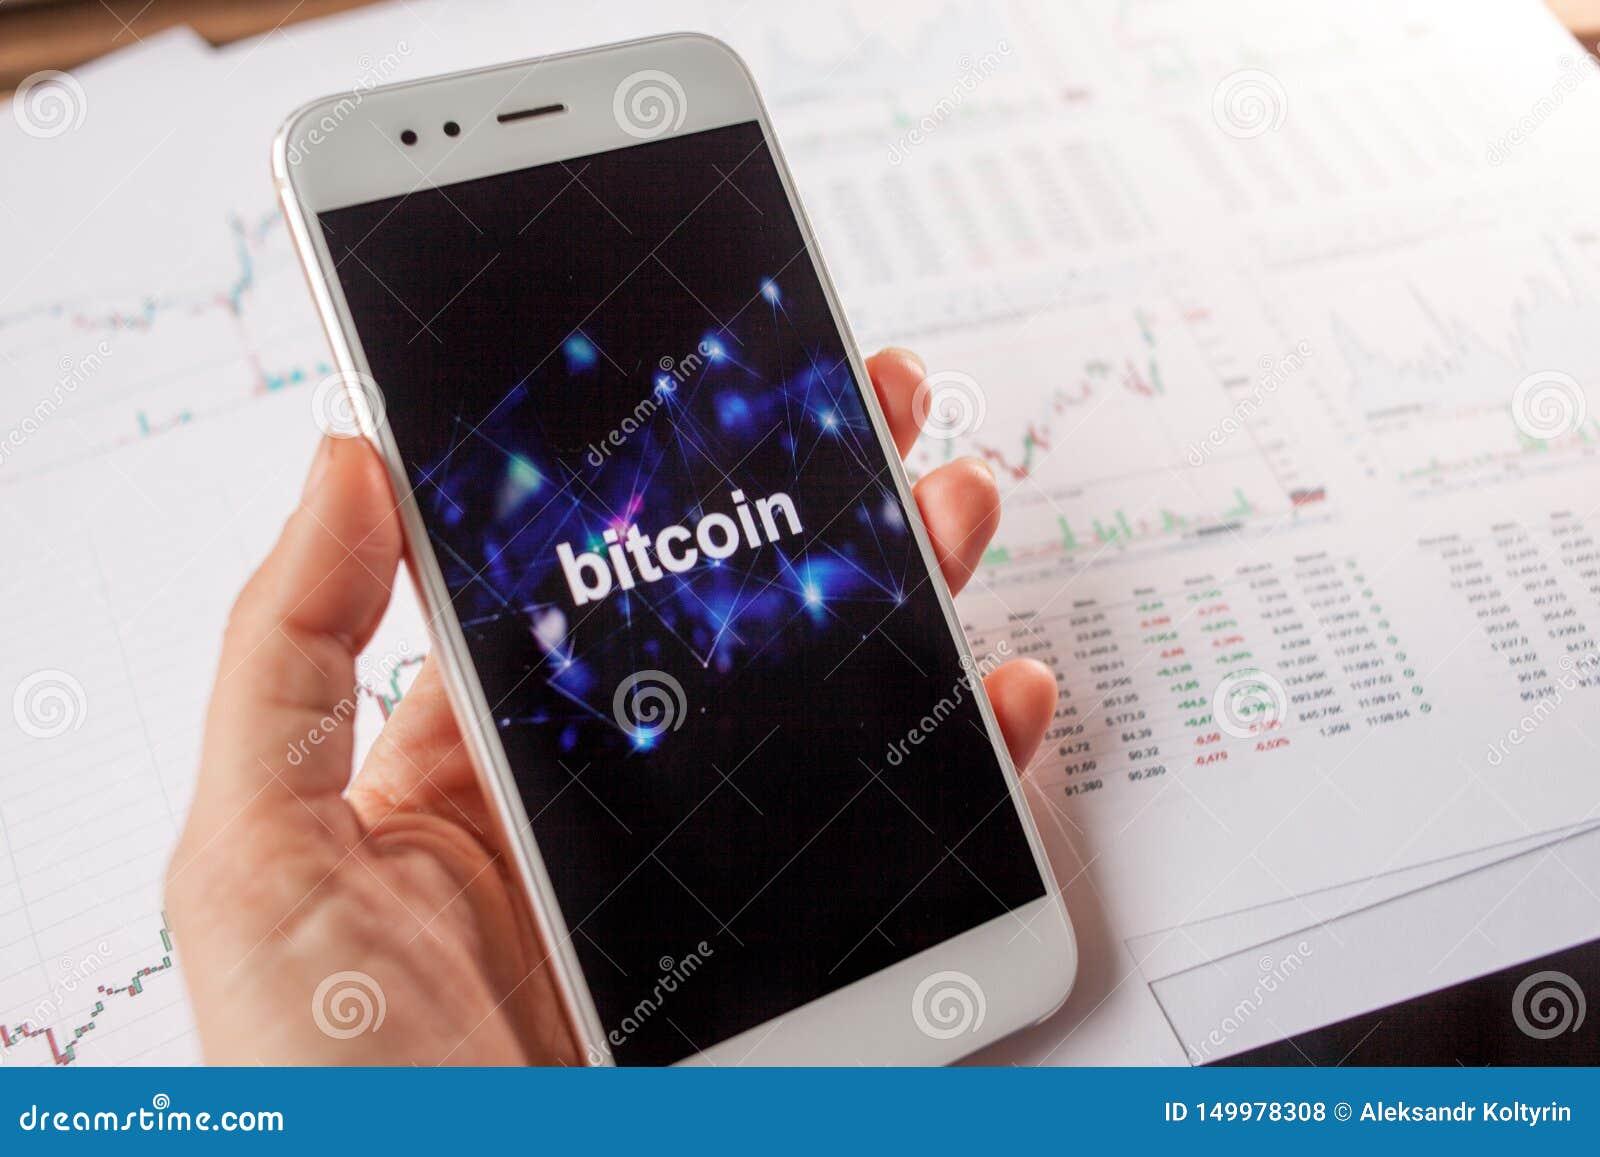 投资在Bitcoin,概念 统计和报告,对cryptocurrency市场的分析